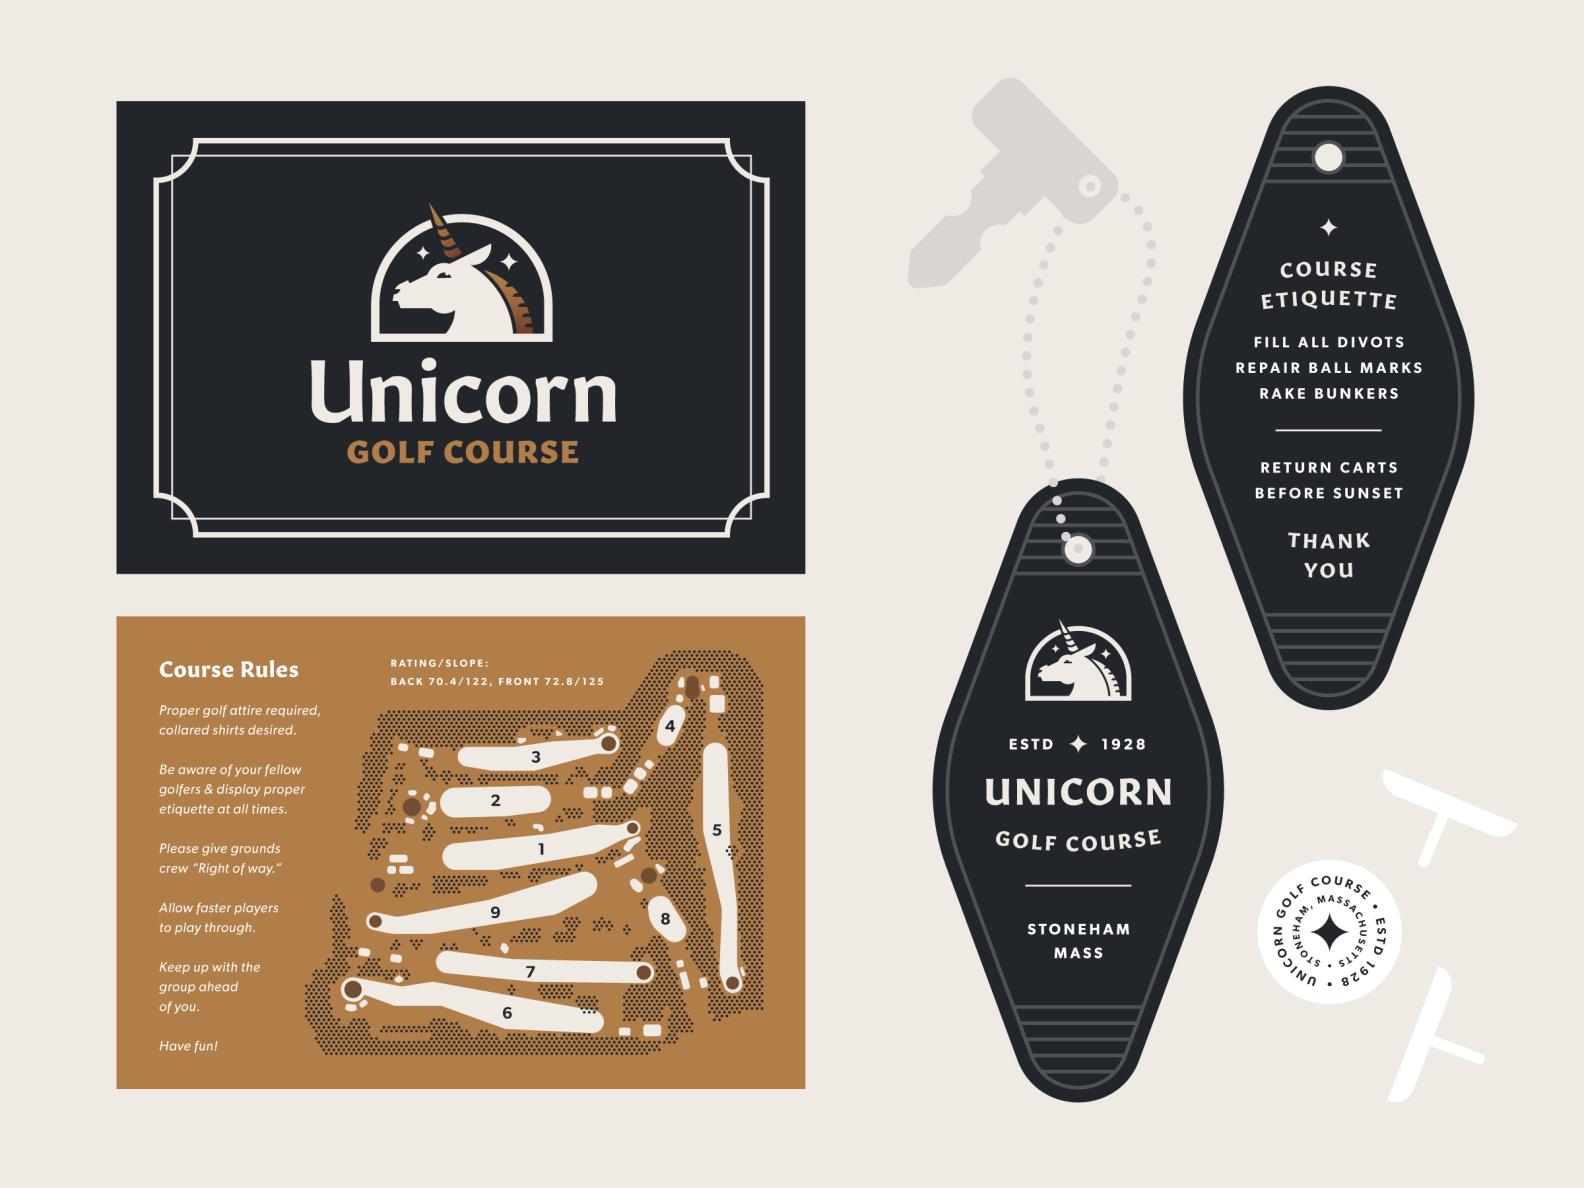 Unicorn Golf Course — 2 𝑜𝑓 3